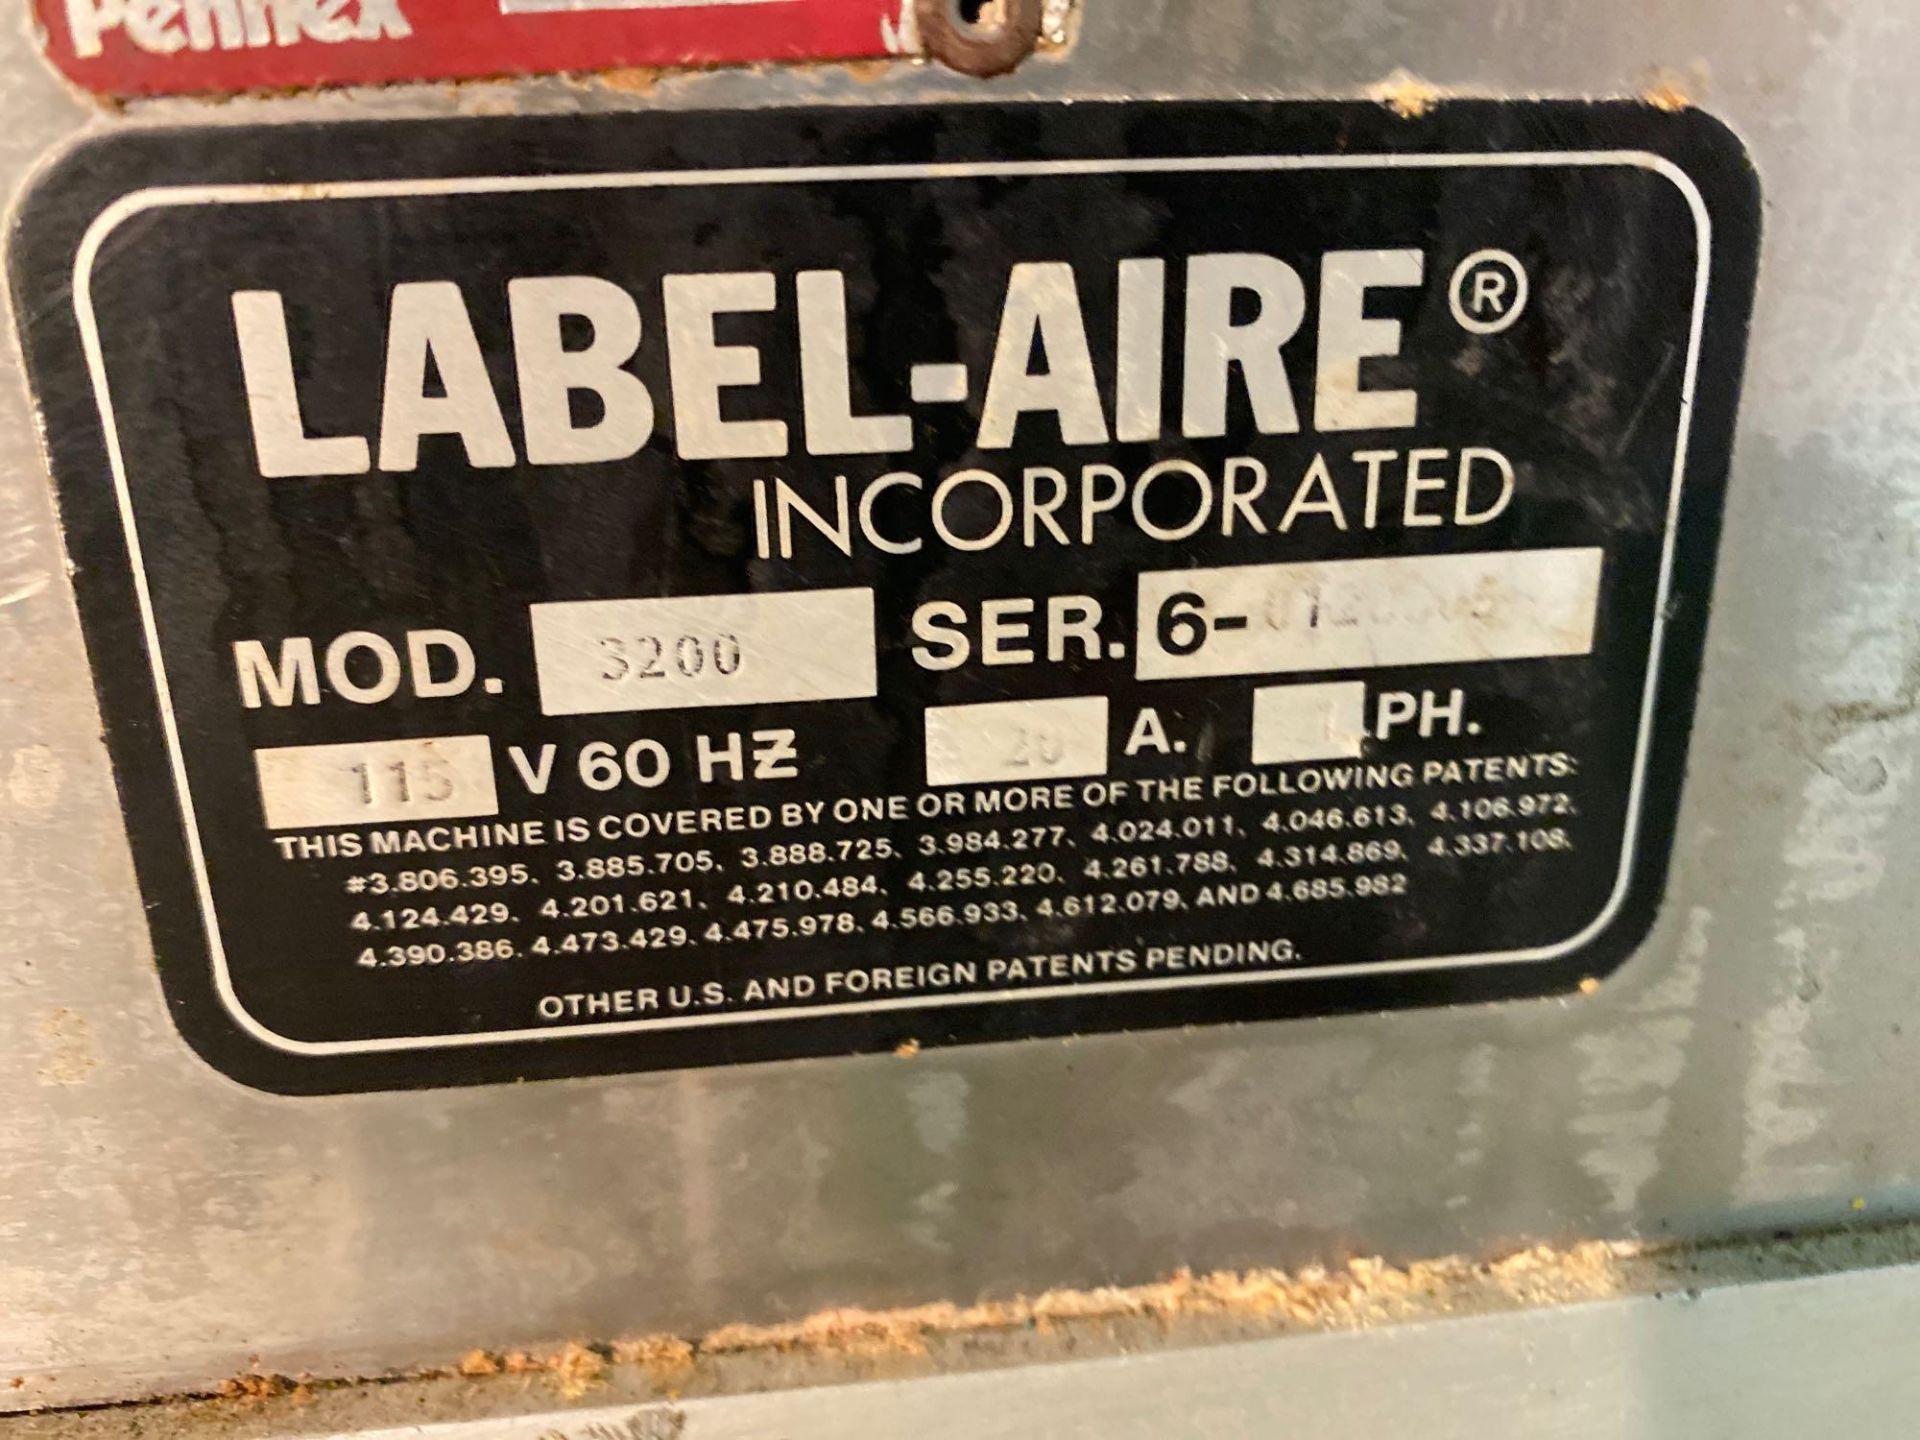 Label-Aire Model 3200 Conveyorized Pressure Sensitive Labeler - Image 4 of 14